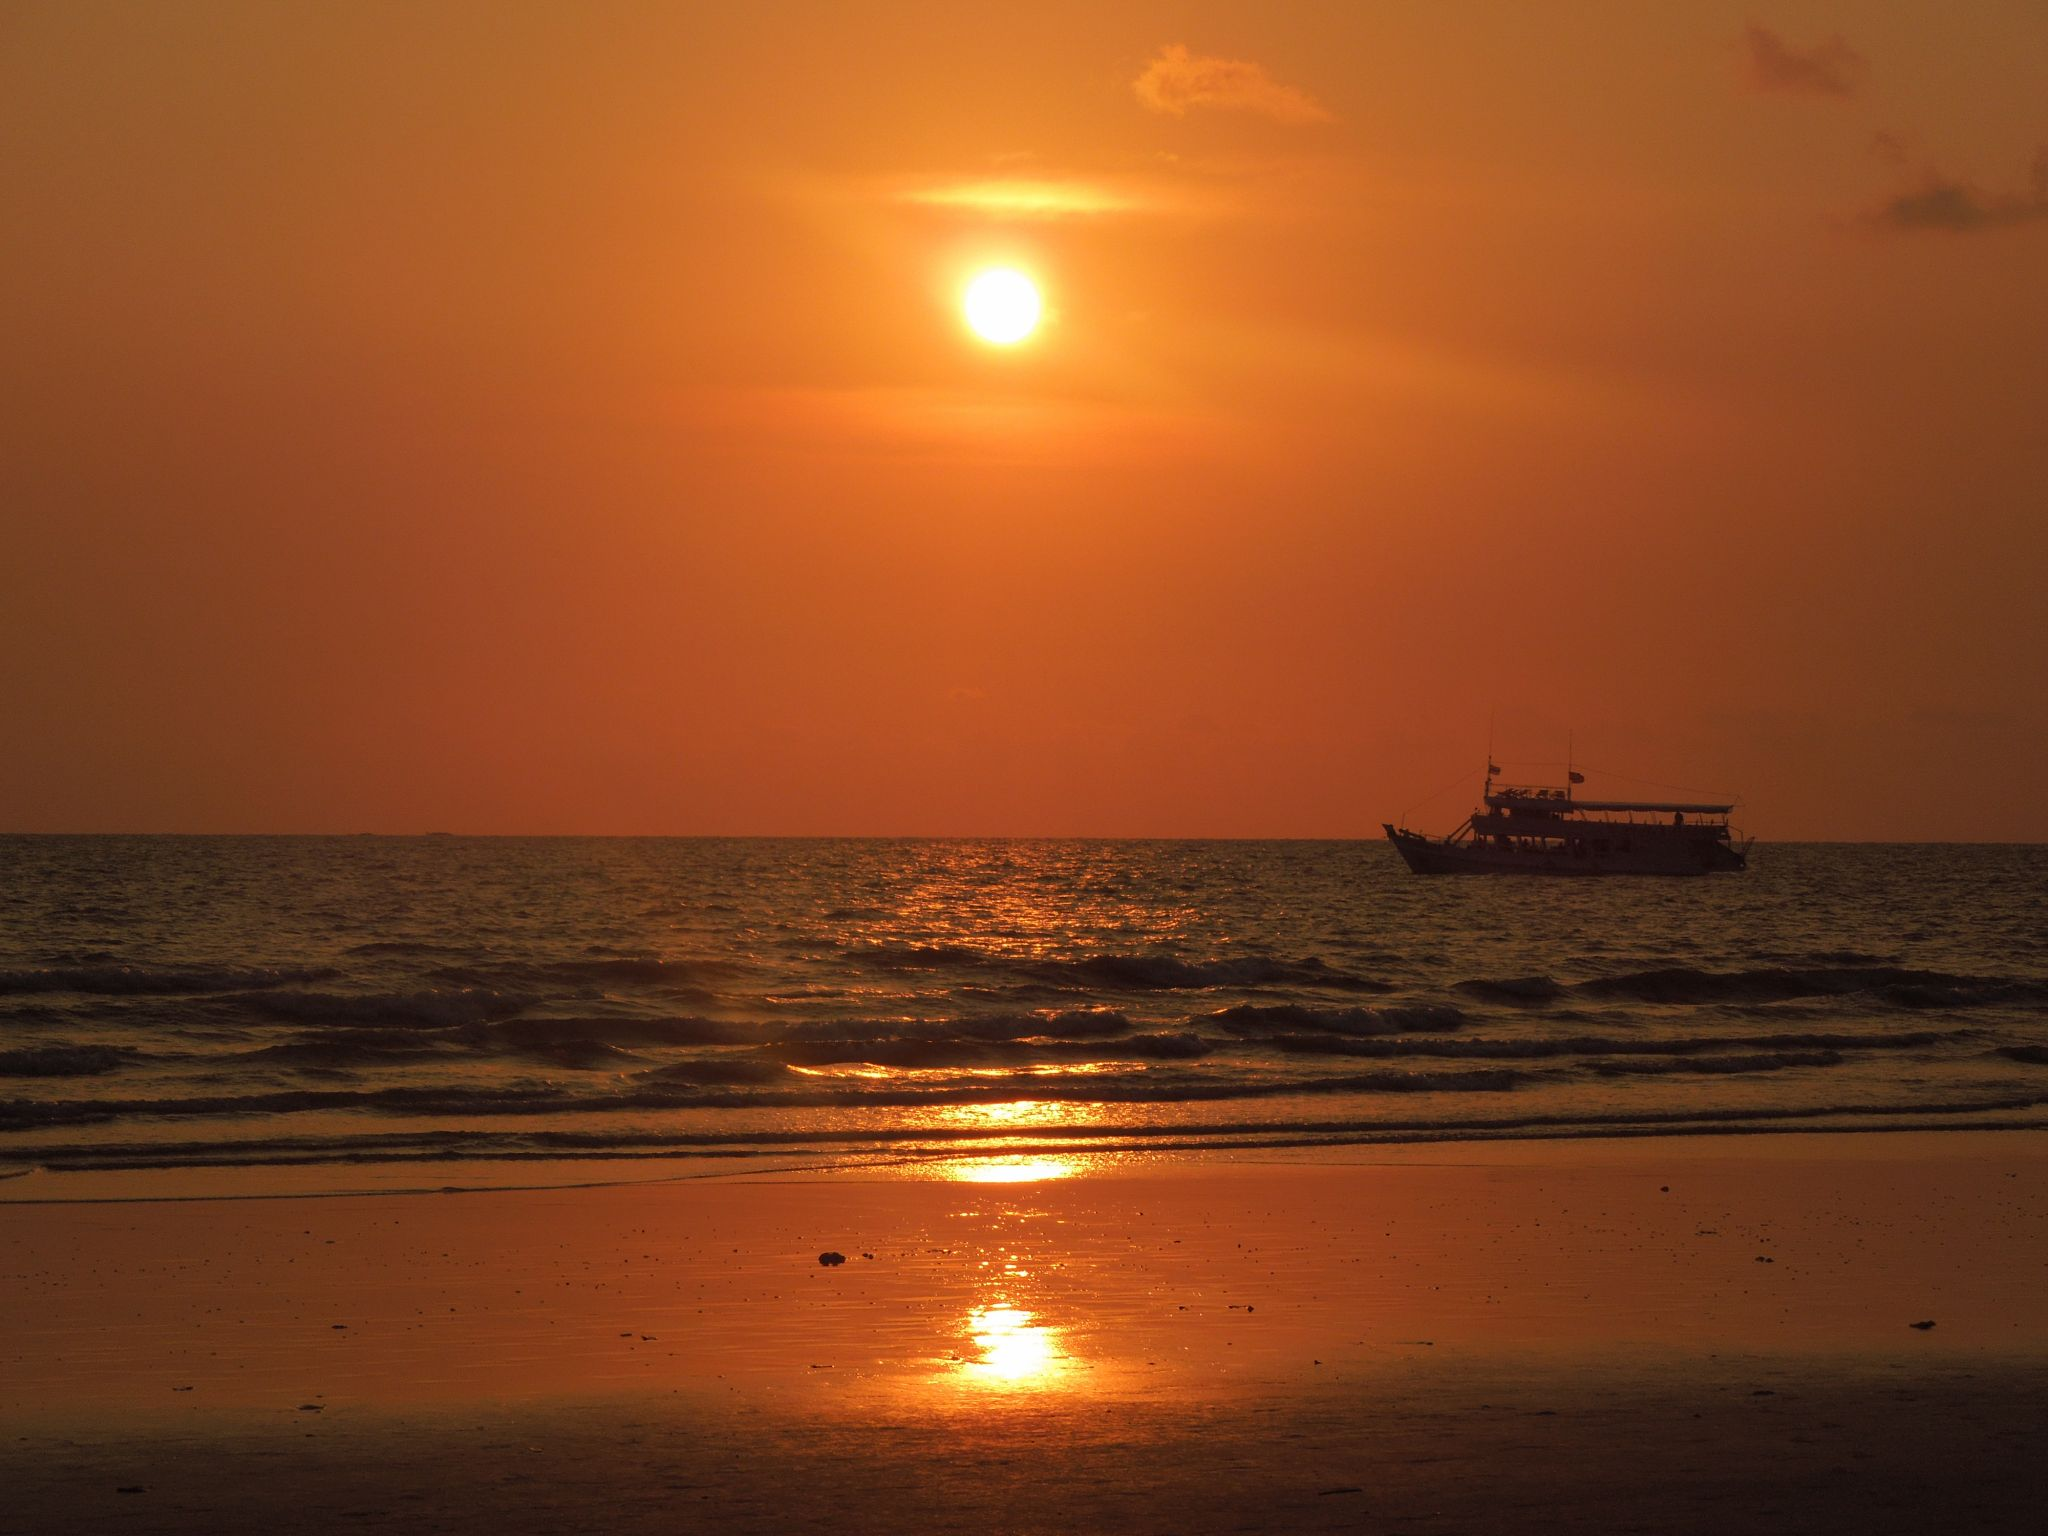 Sunset at Klong Prao Beach, Thailand